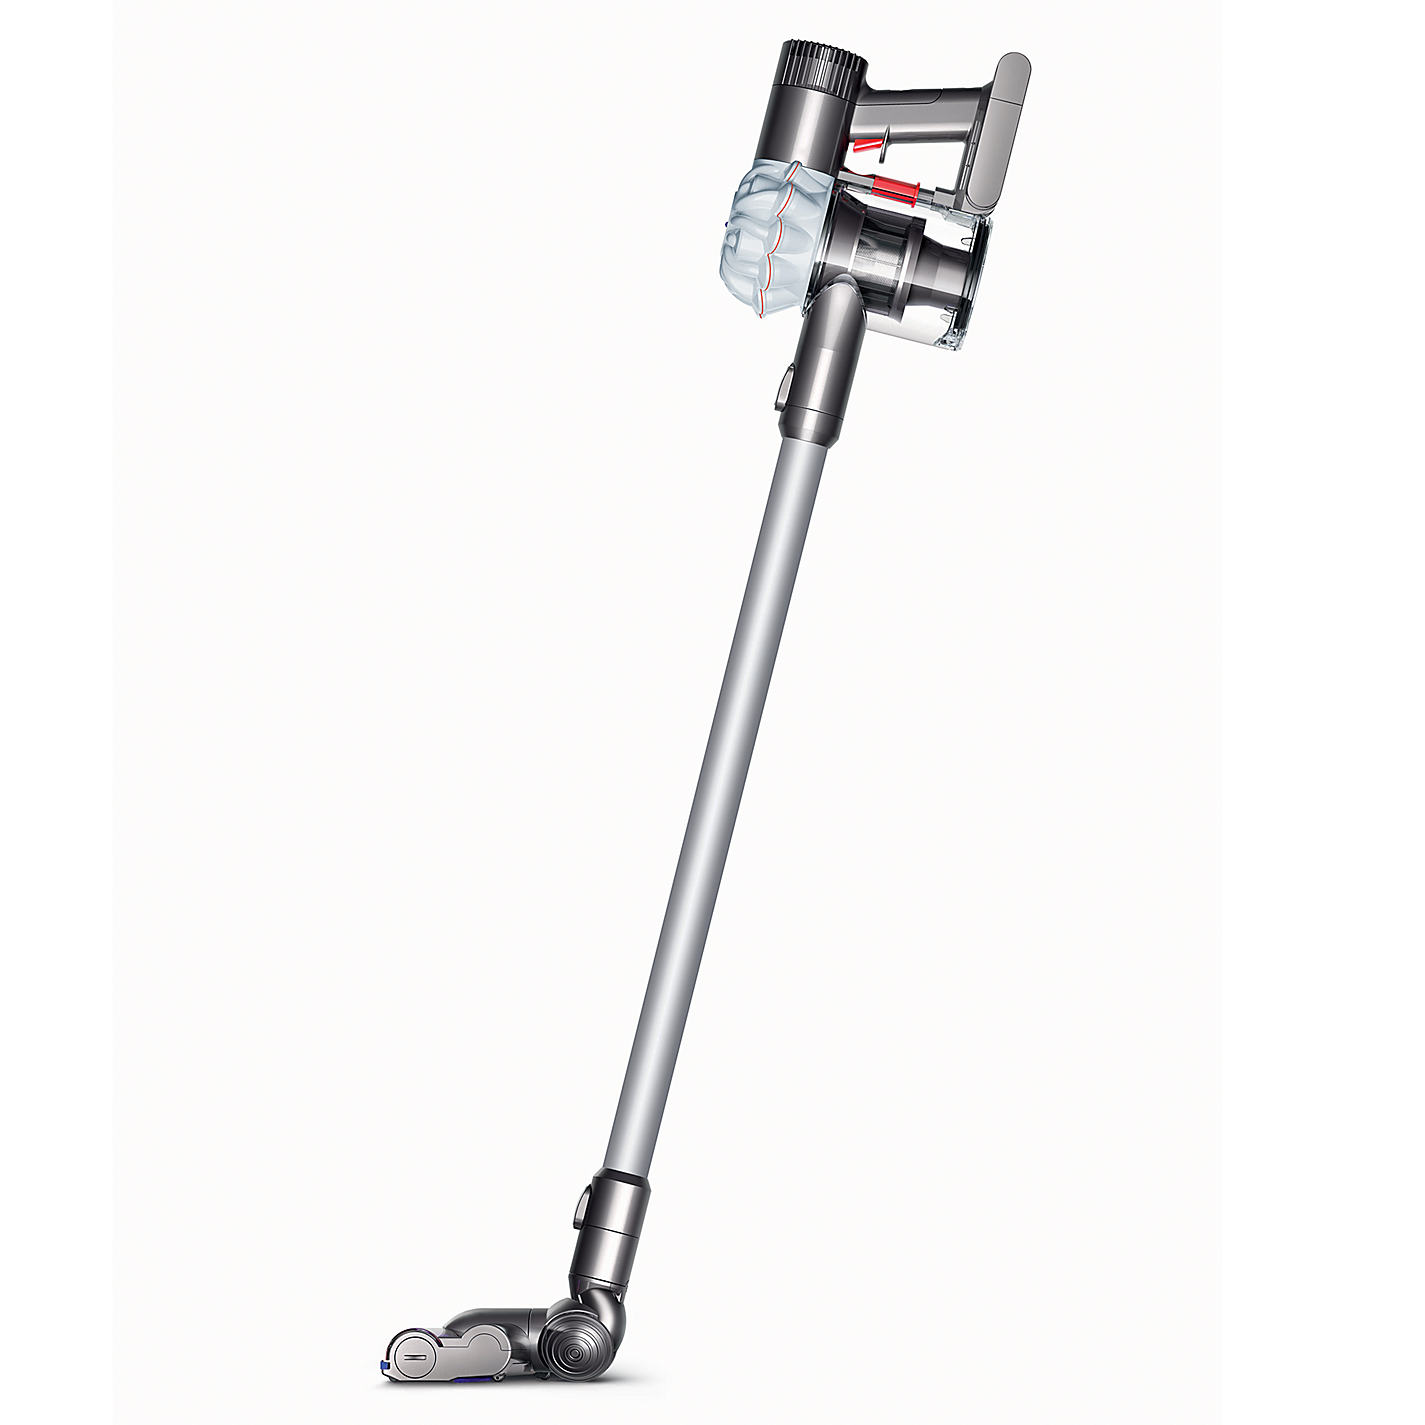 Dyson new v6 cordless vacuum cleaner jack fitzgerald - Dyson digital slim flexi v6 ...